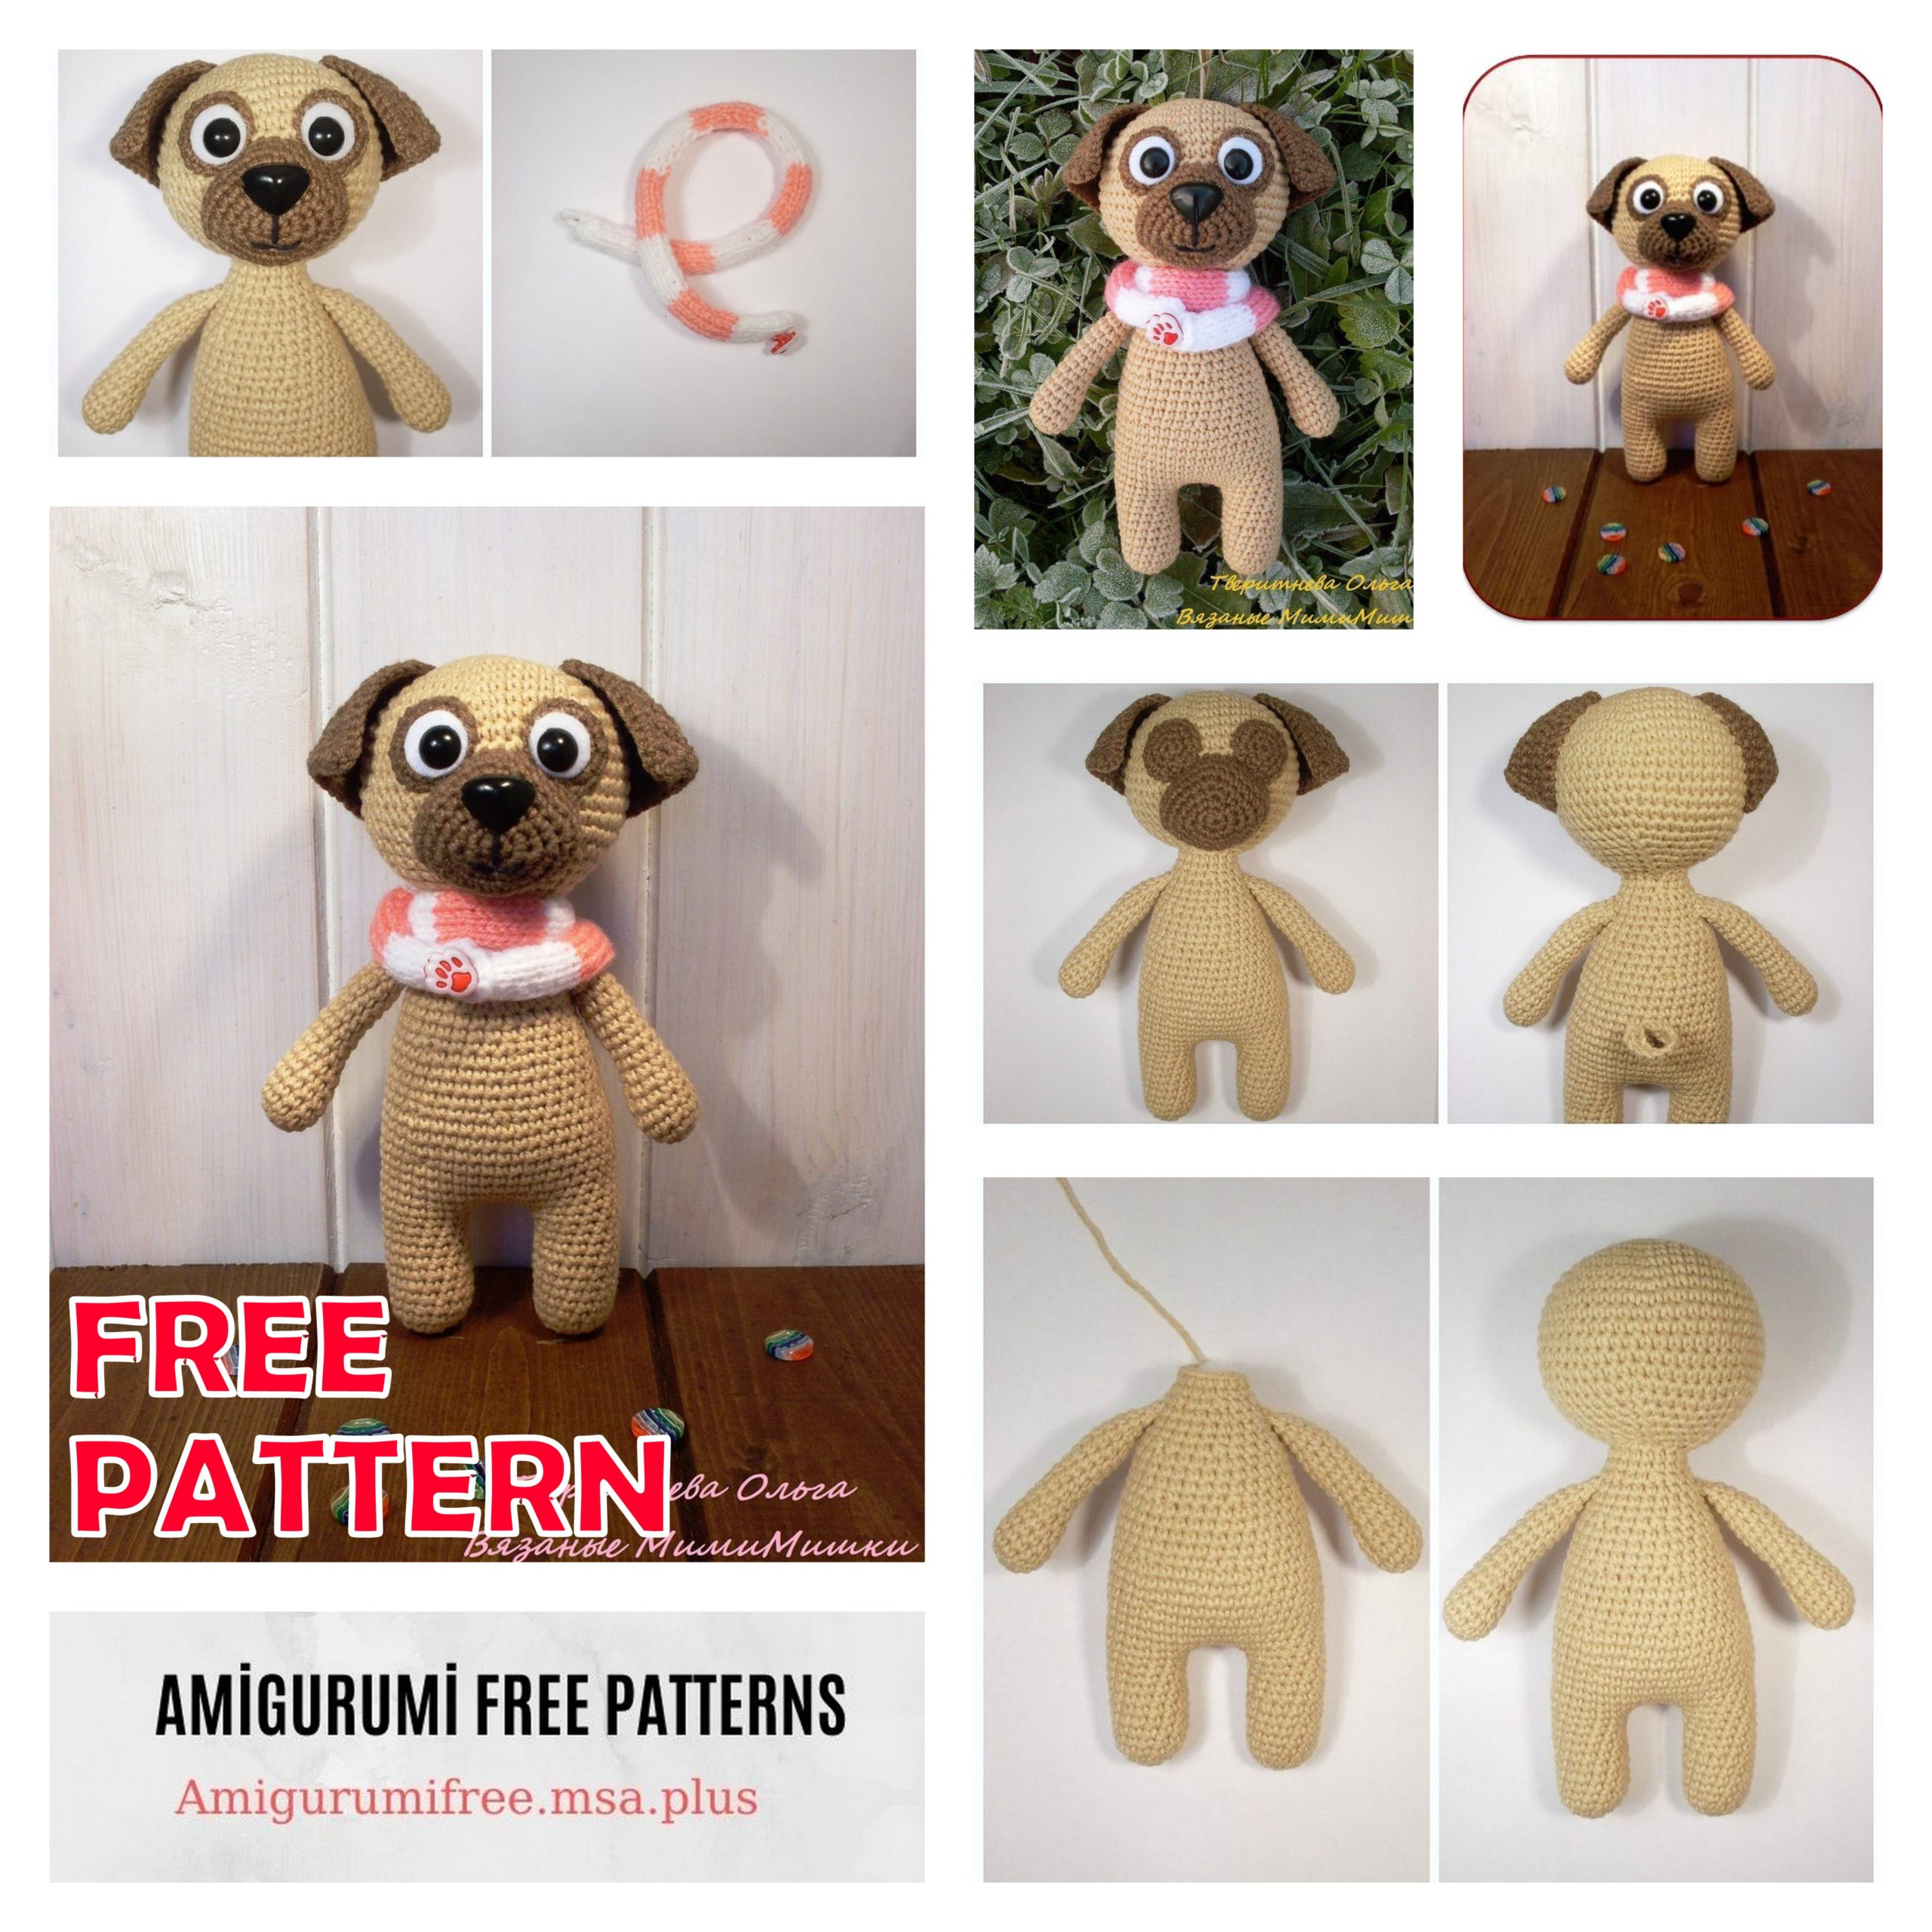 Pug Puppy Amigurumi Pattern (Crochet Pattern Books) (English ... | 2560x2560